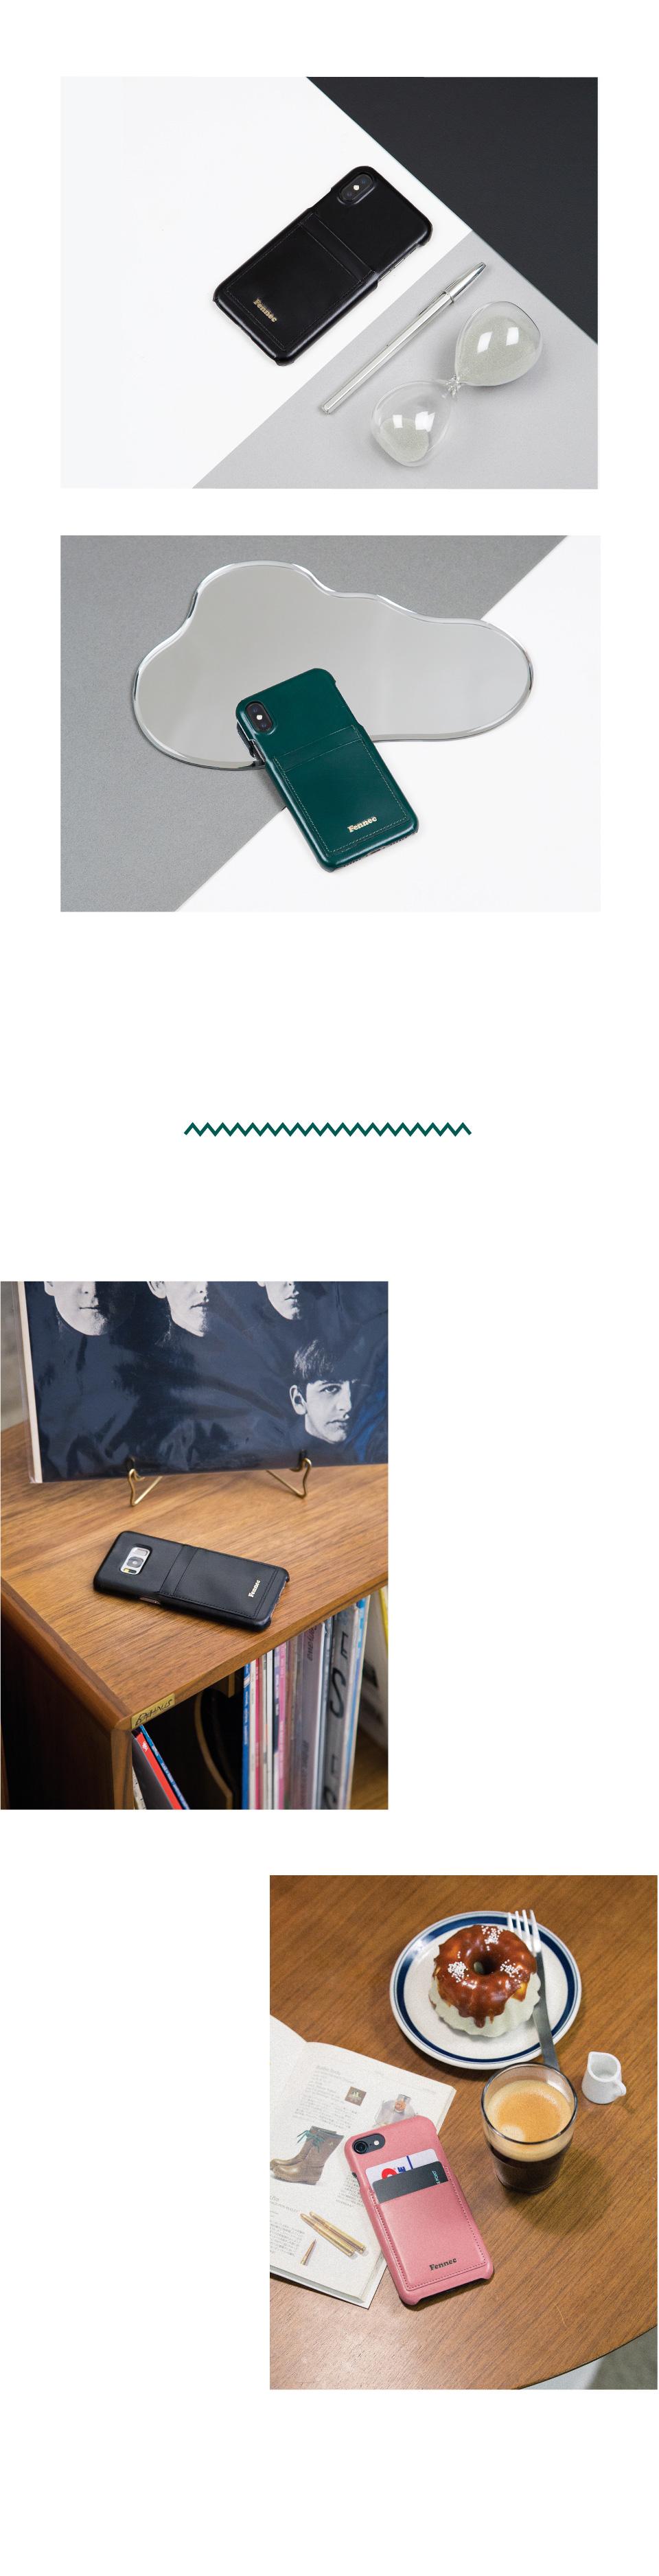 10x10-iphone-x,xs_02.jpg